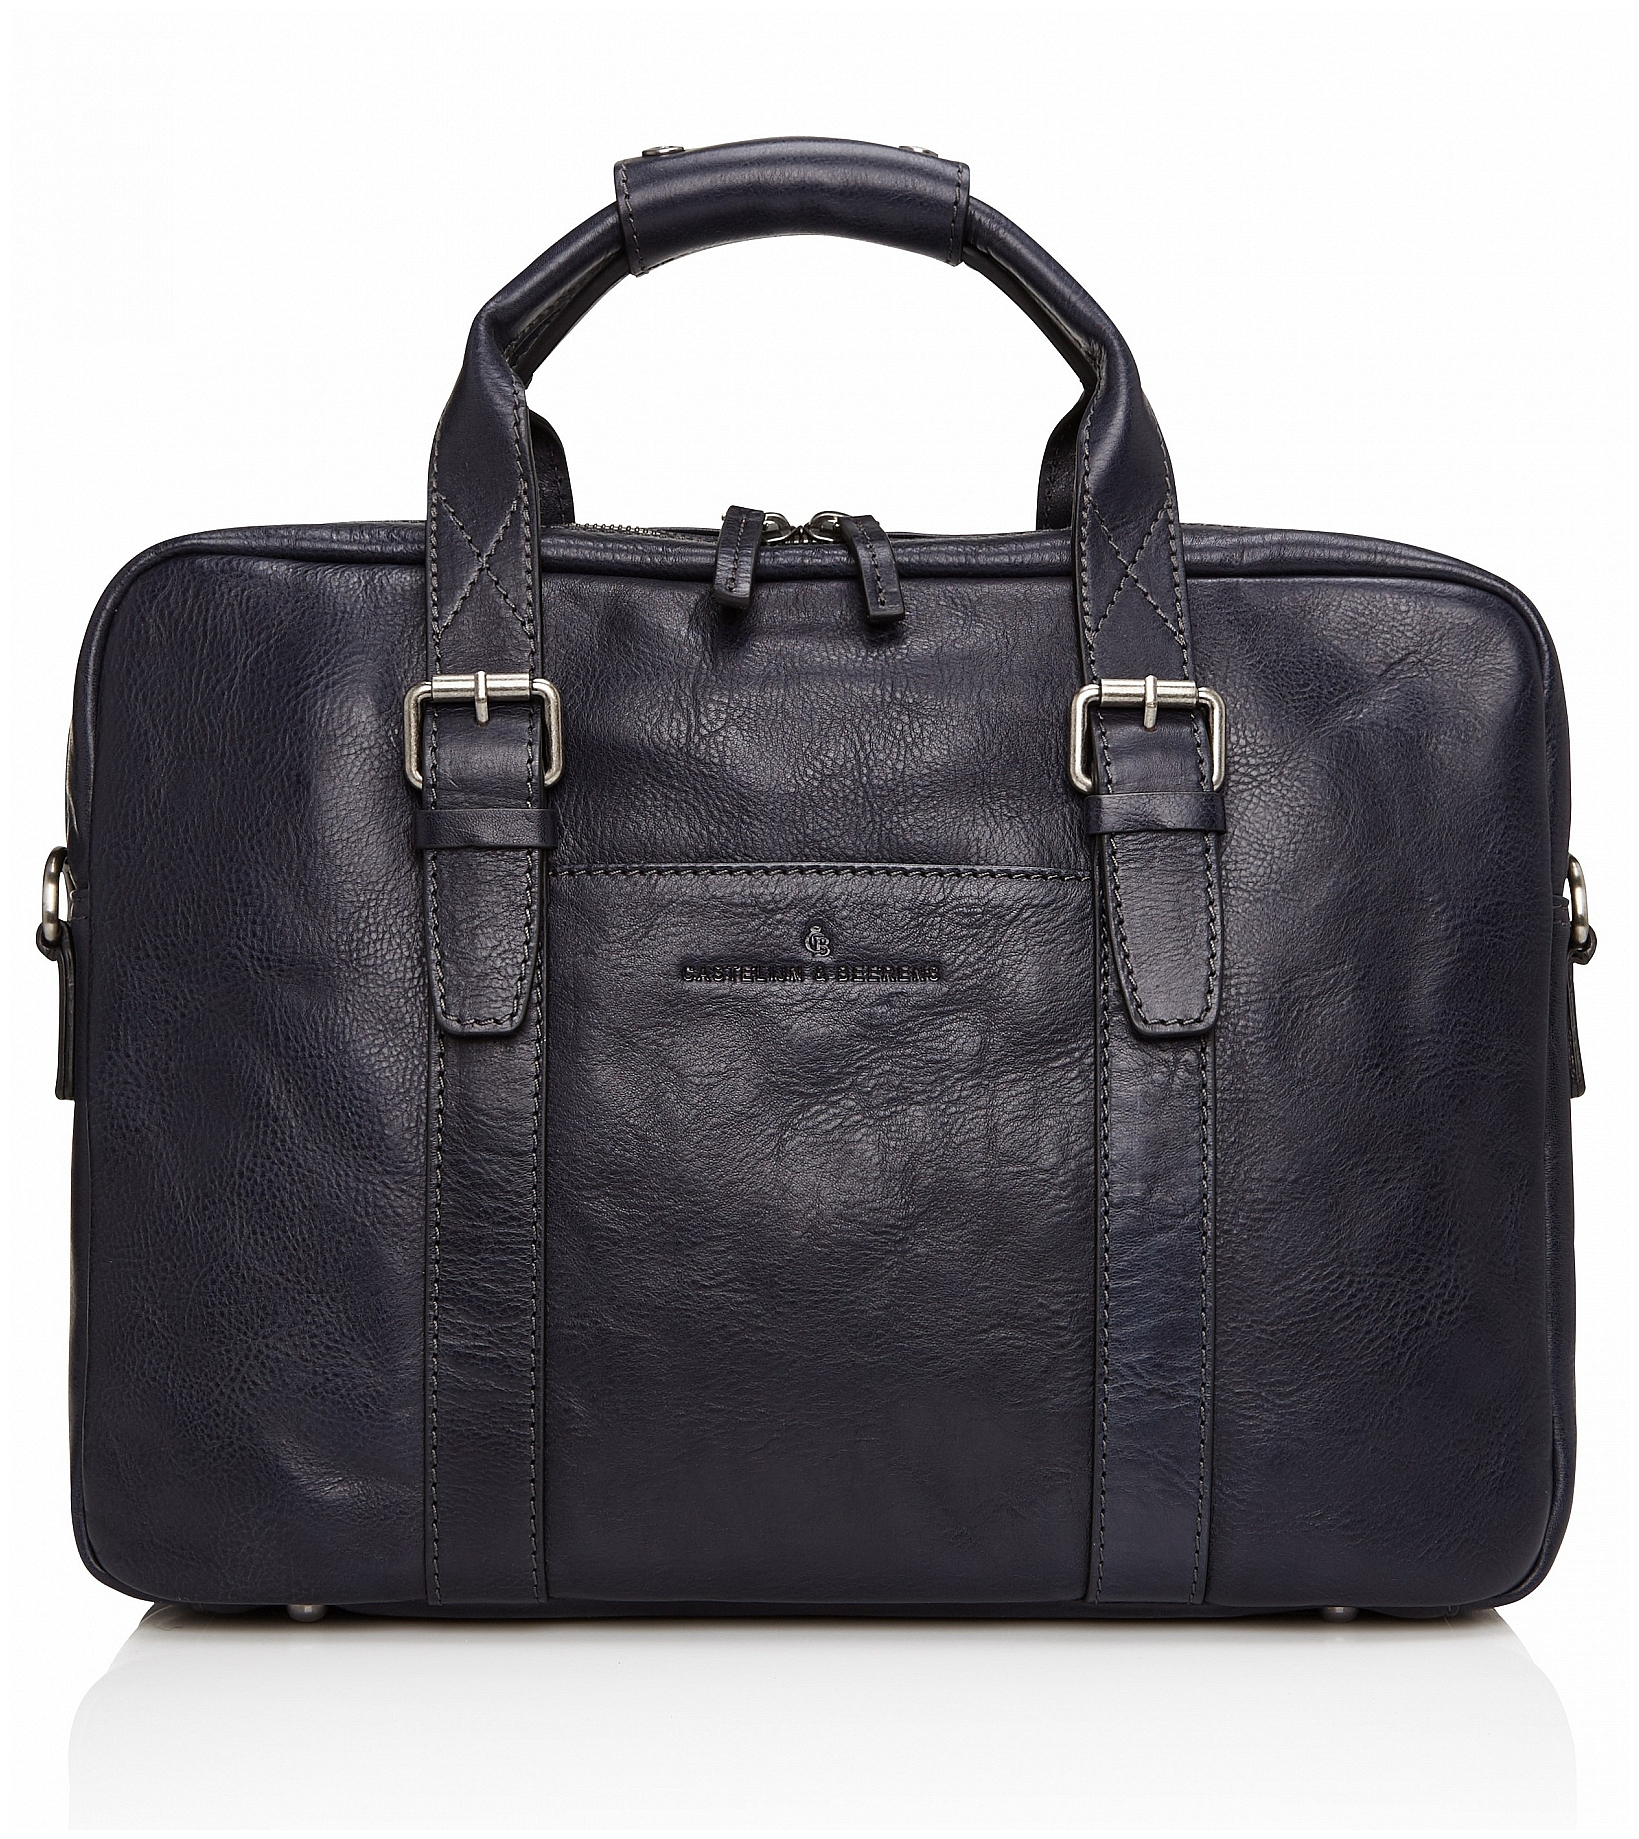 Castelijn & Beerens Kožená taška na notebook a tablet Bravo 639473 tmavě modrá